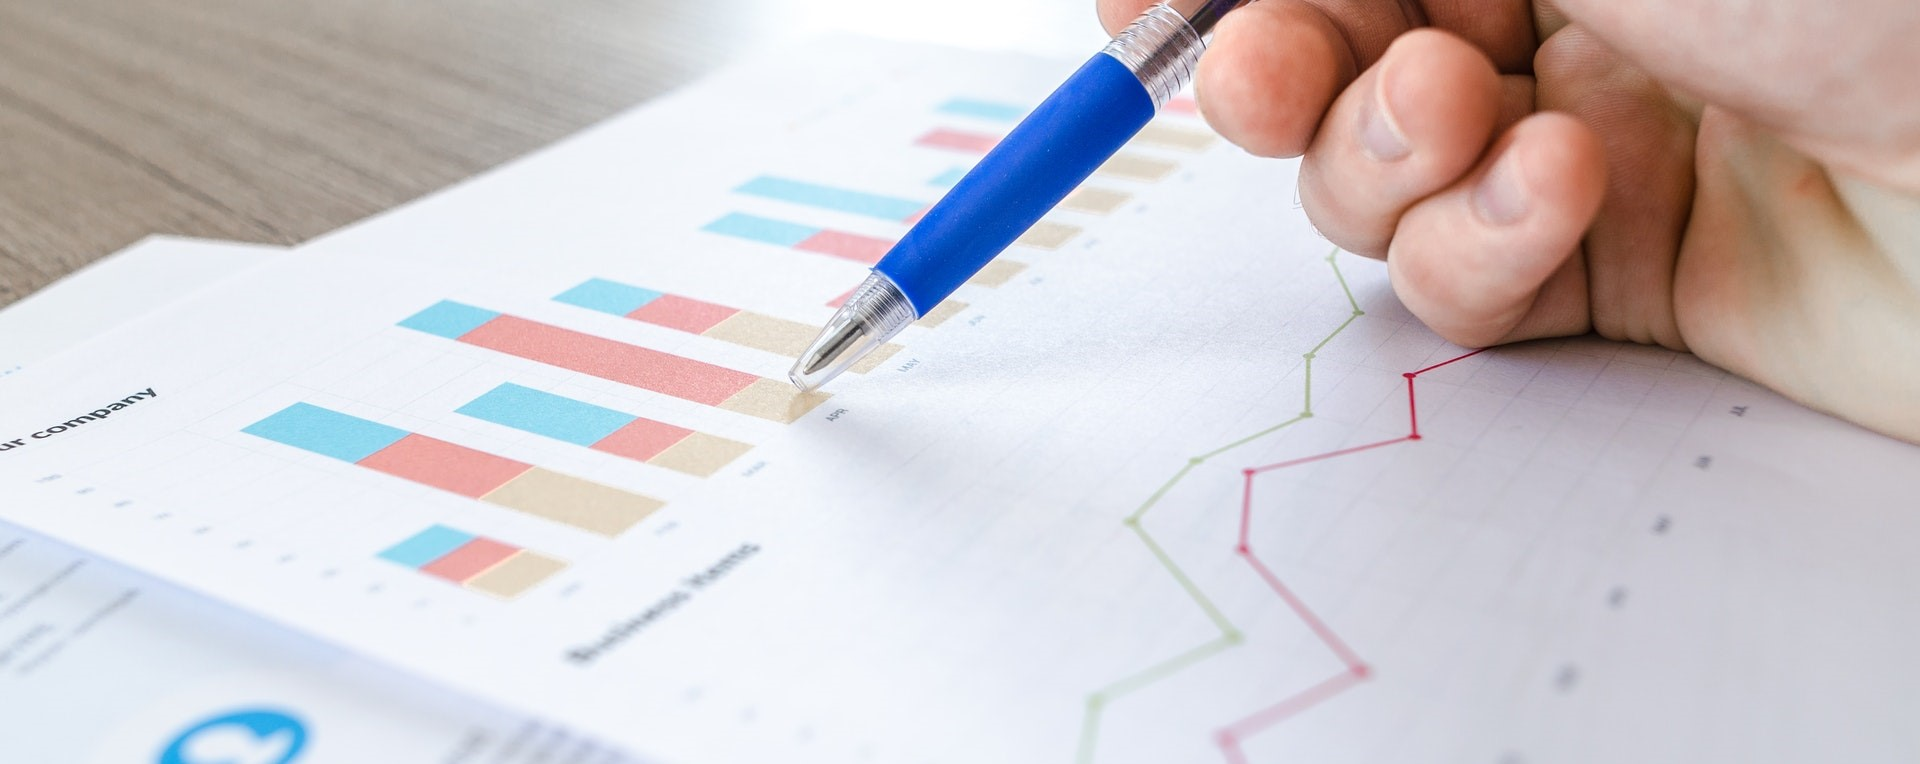 chart-close-up-data-desk-590022-2